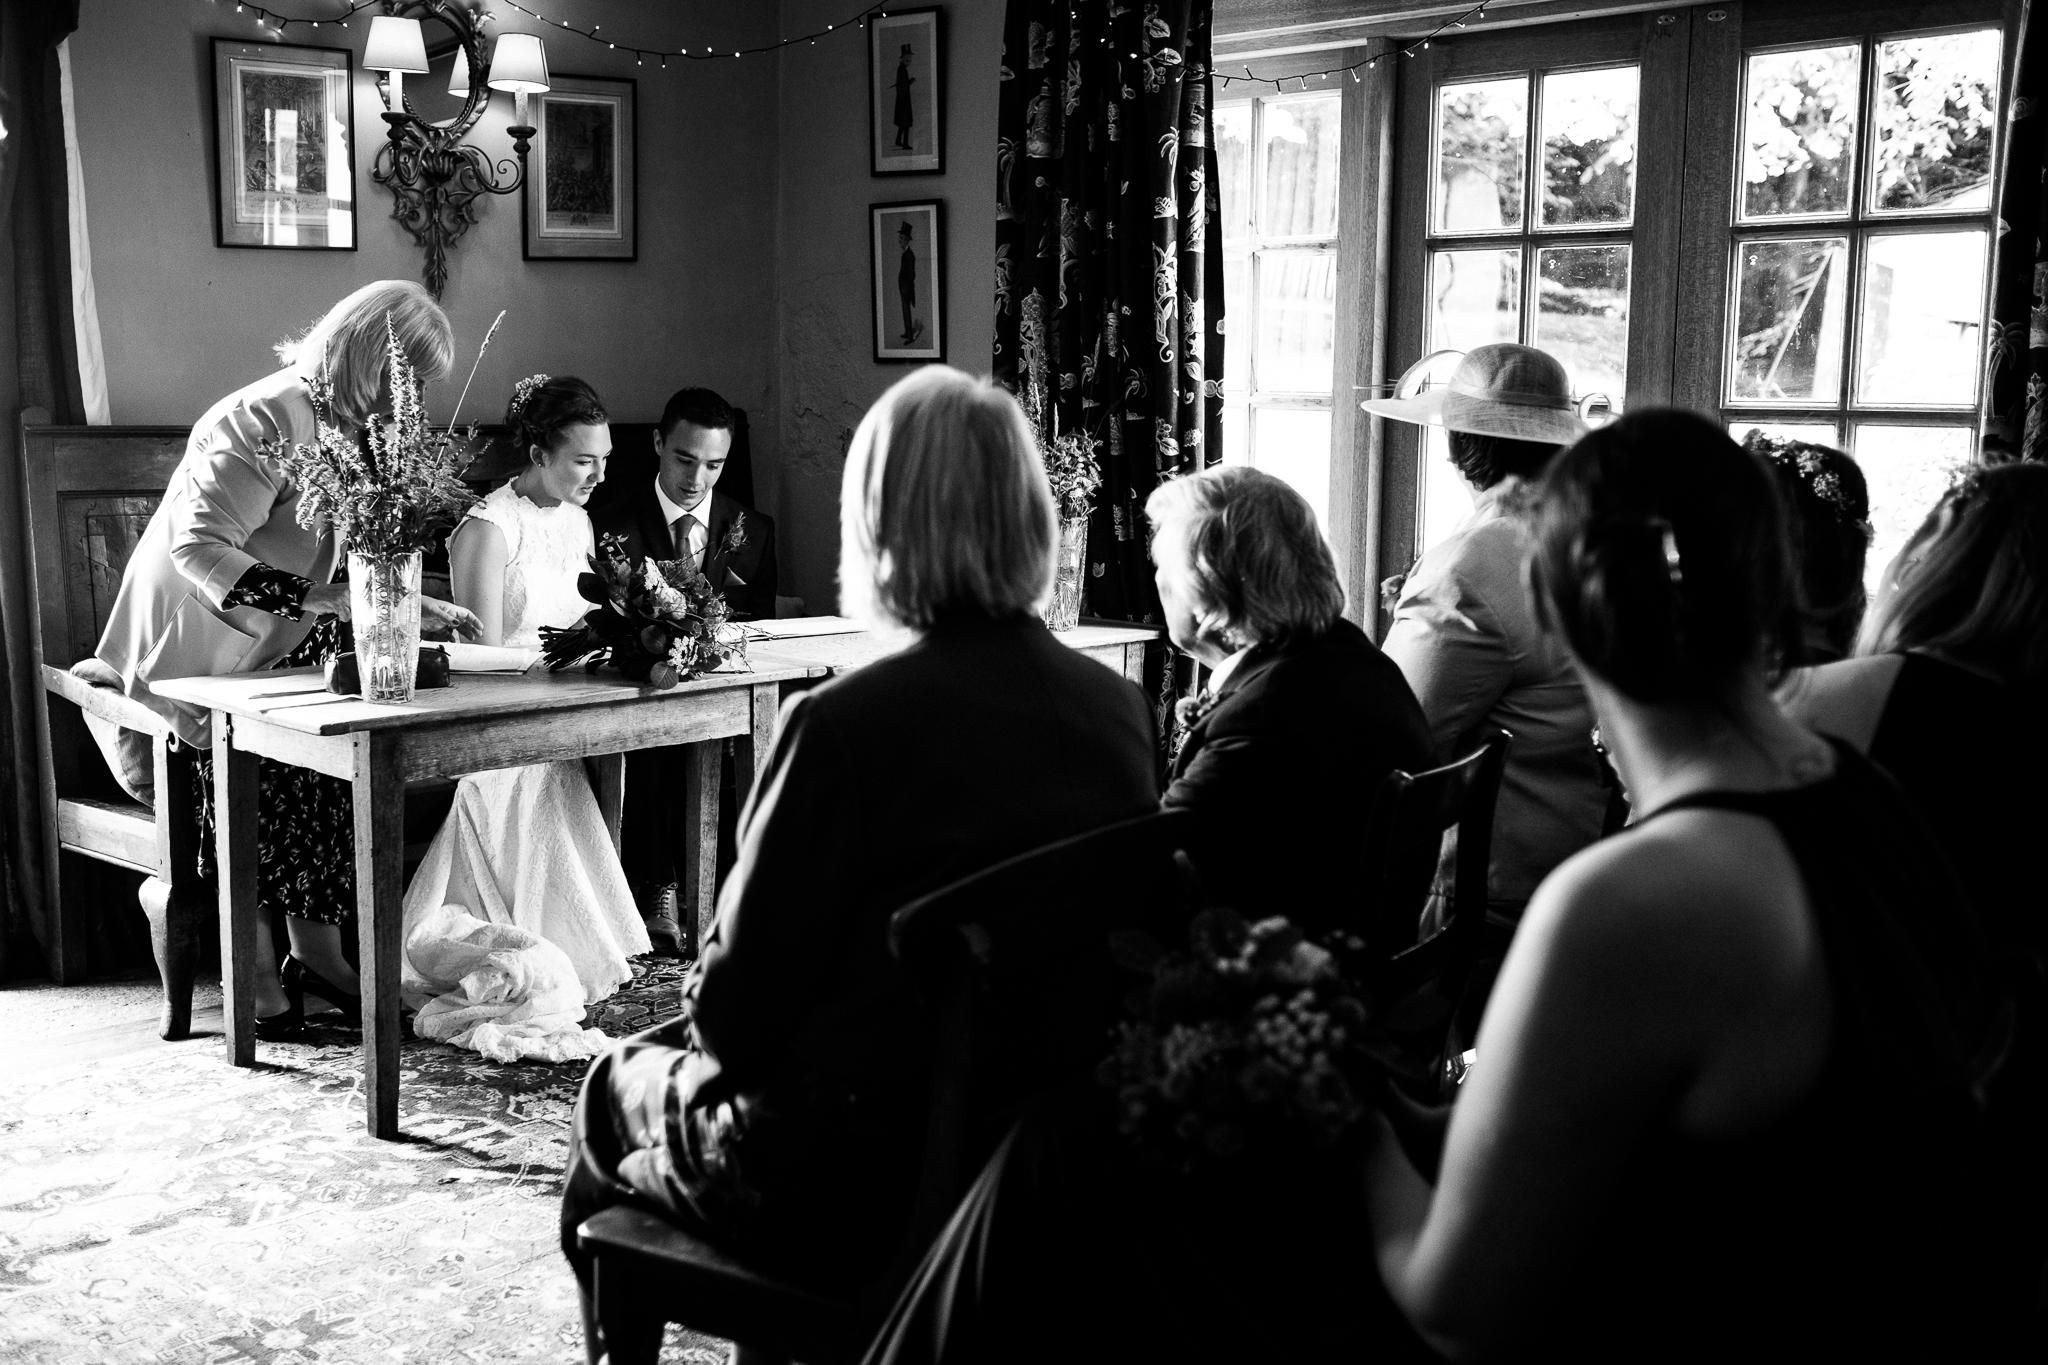 Relaxed Documentary Wedding Photography at The Wizard Inn, Alderley Edge Cheshire - Jenny Harper-34.jpg